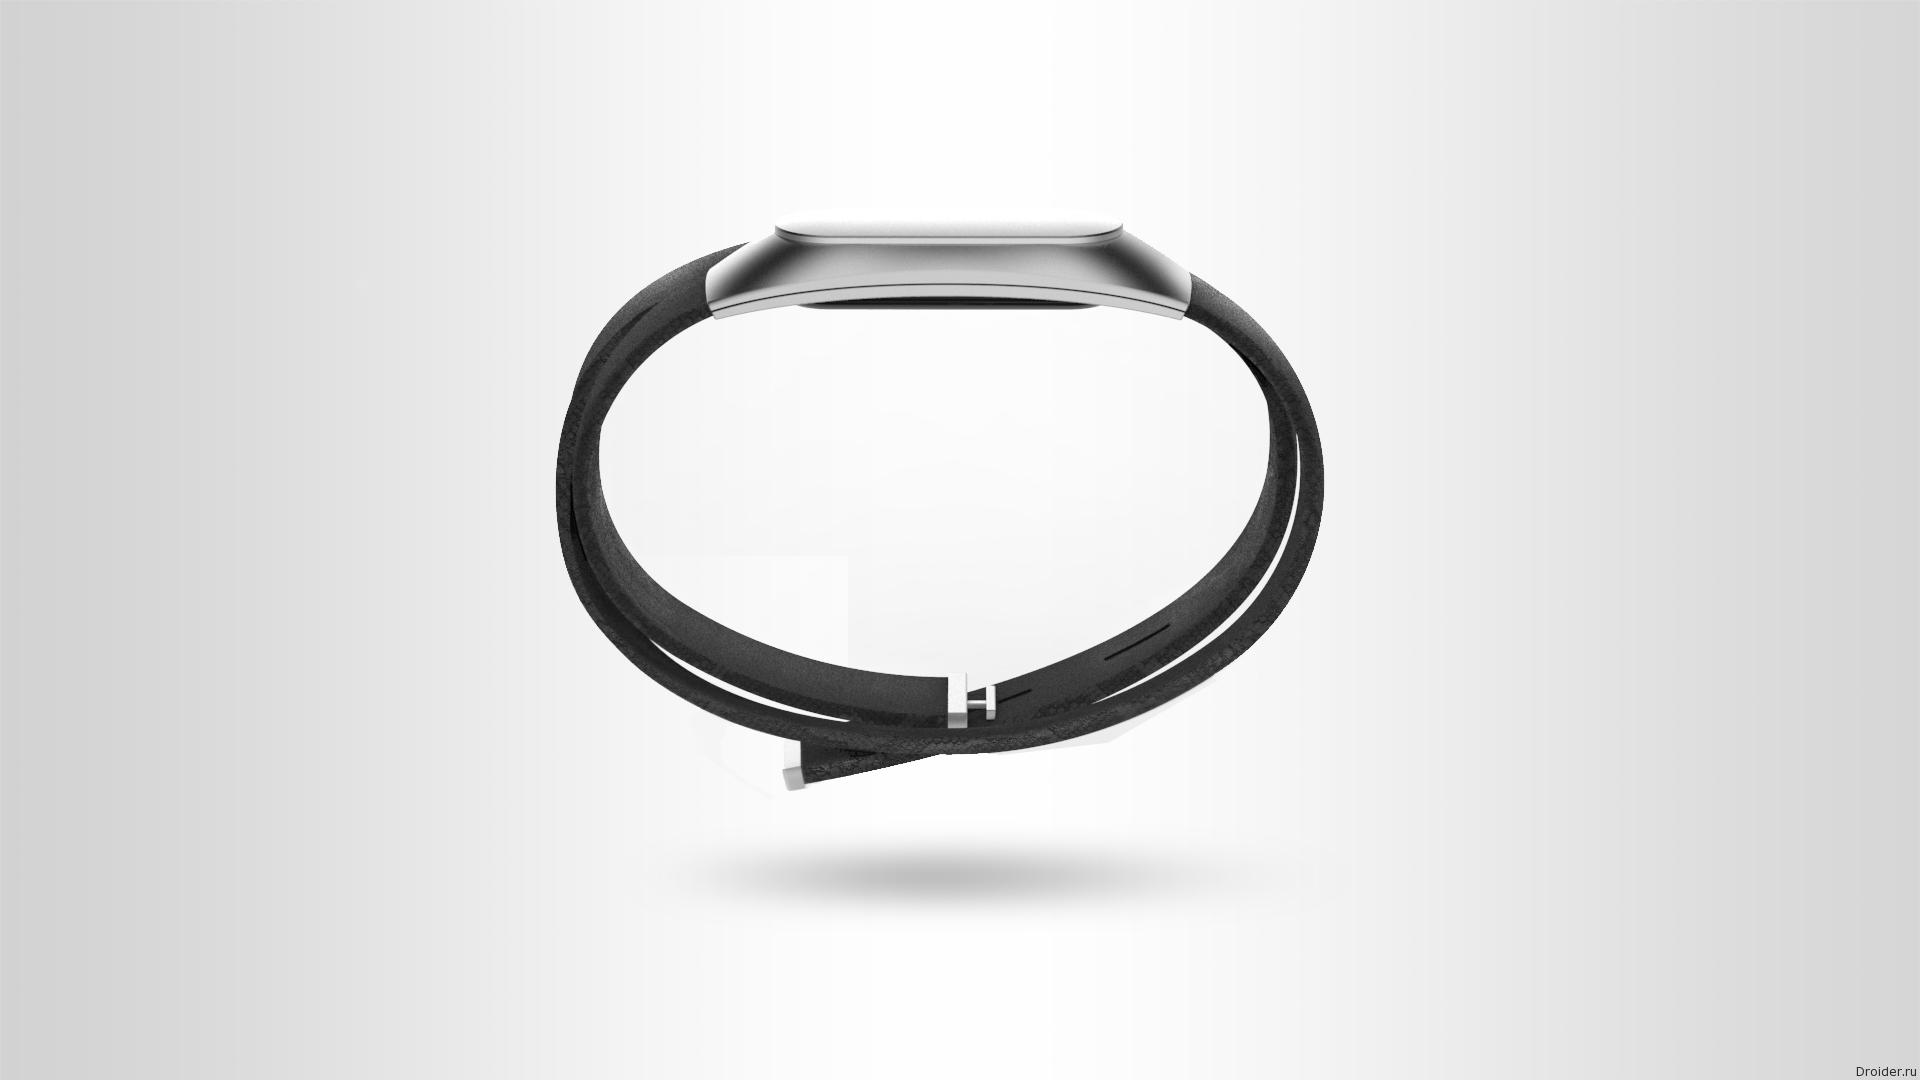 Mi Band 1S от Xiaomi замечен на «живых» фотографиях